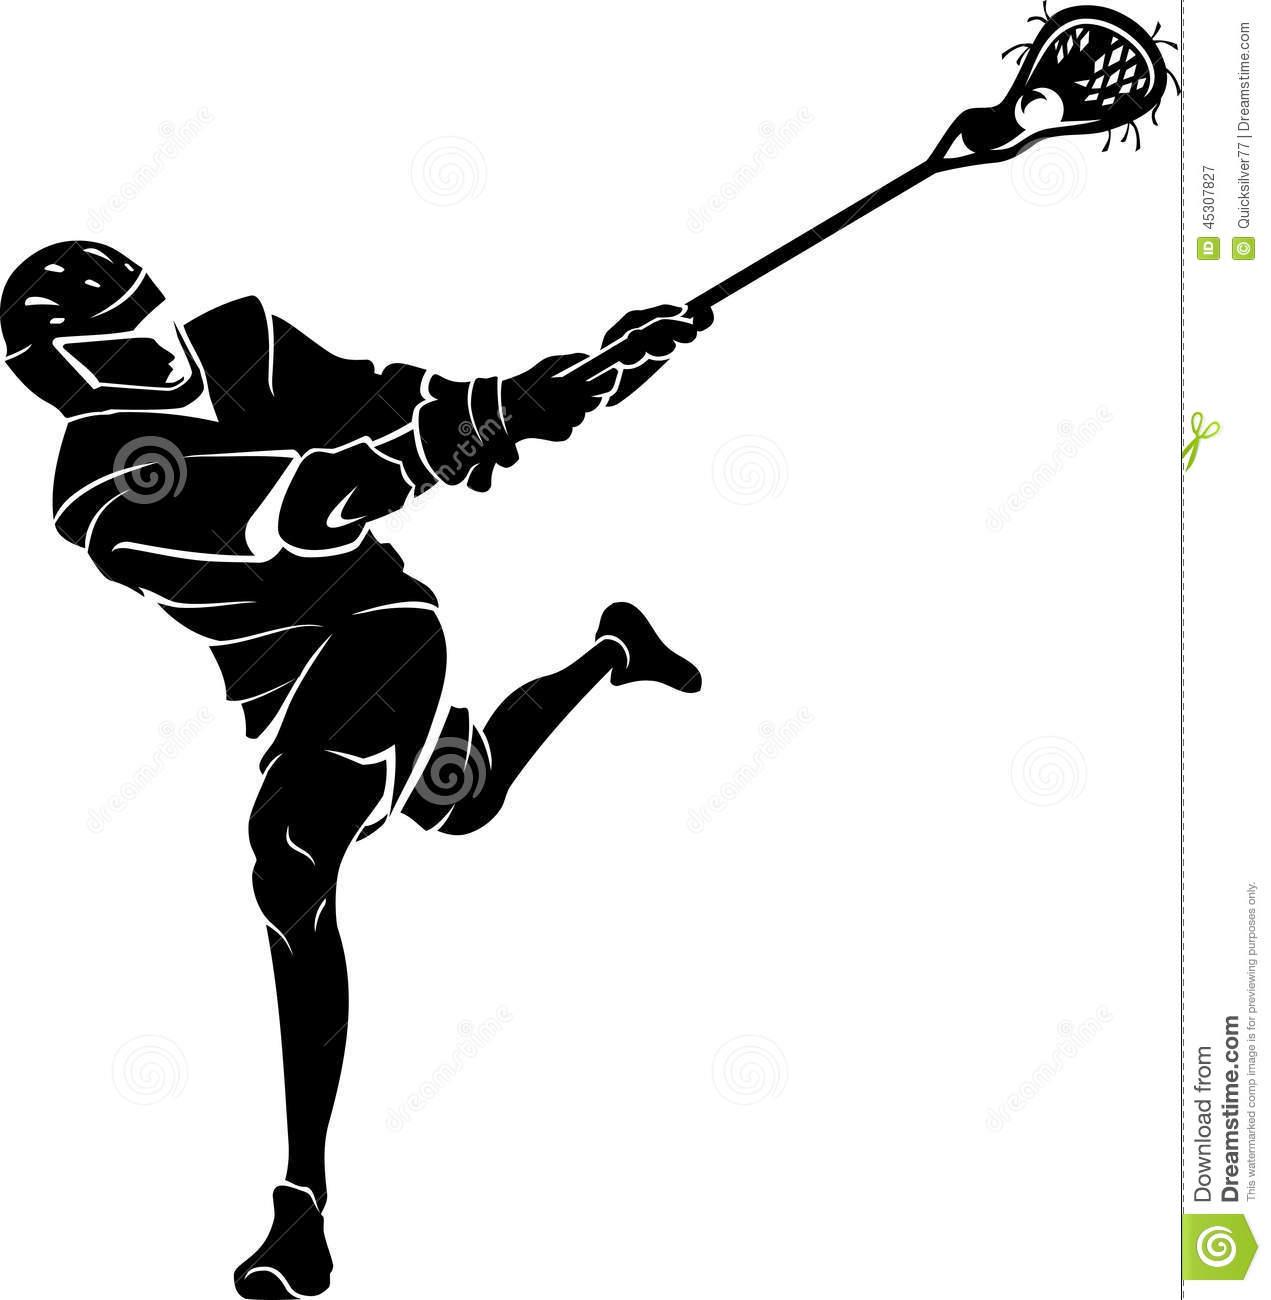 1271x1300 Free Lacrosse Clipart